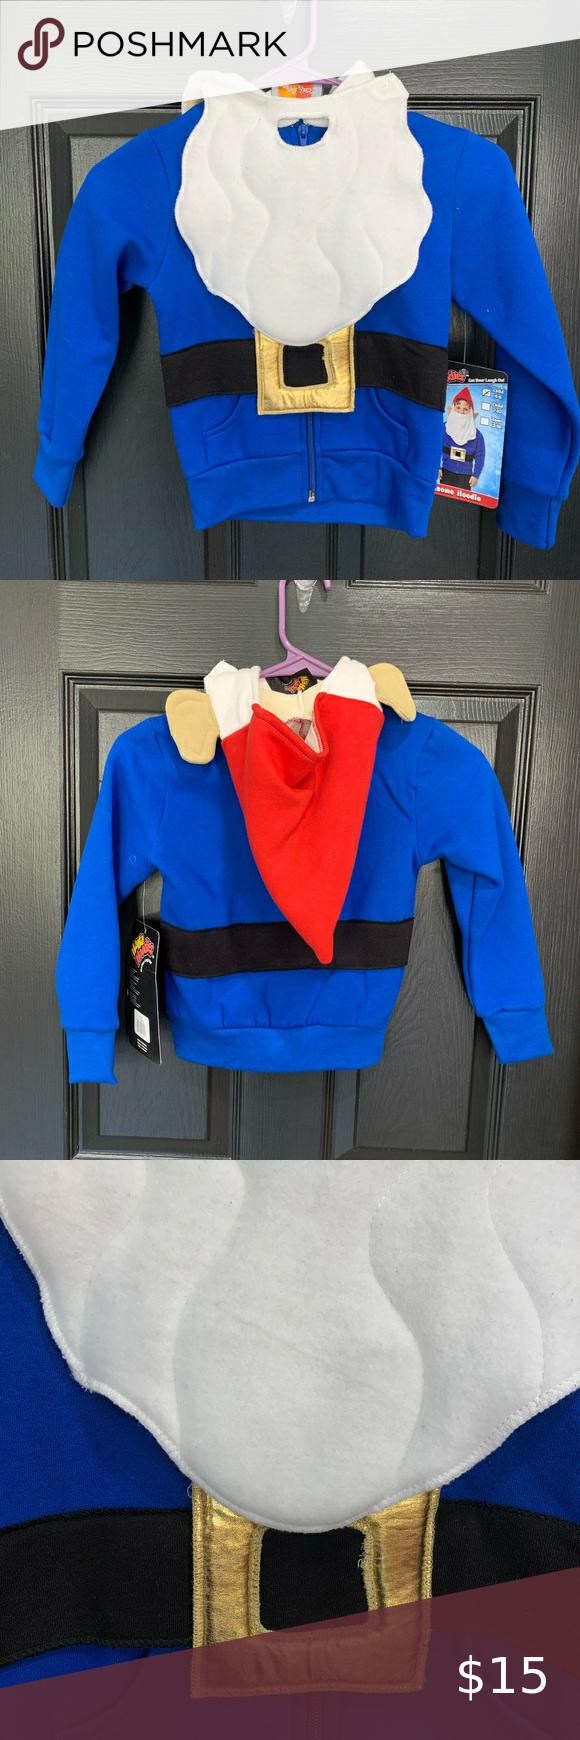 "GNOME Costume Hoodie HA HA HOODIES 5/6 New with tags! Chest 14"" sleeve 17"" length 17"" Shirts & Tops Sweatshirts & Hoodies"